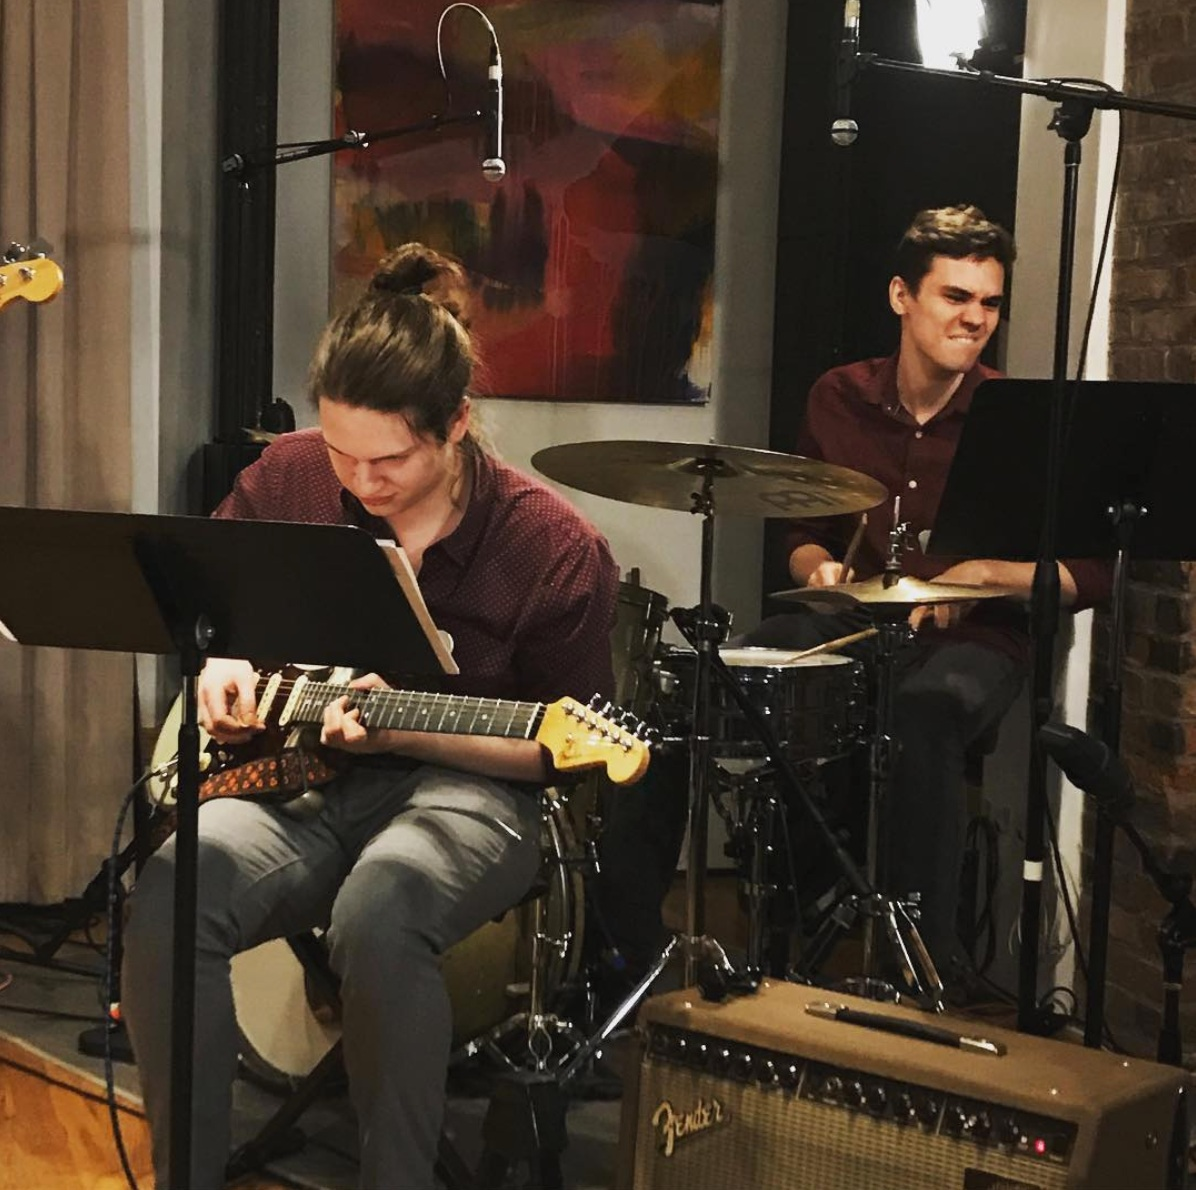 stank facin' and twinning at Dani Strigi's junior composition recital, April 2019 at Scholes Street Studio